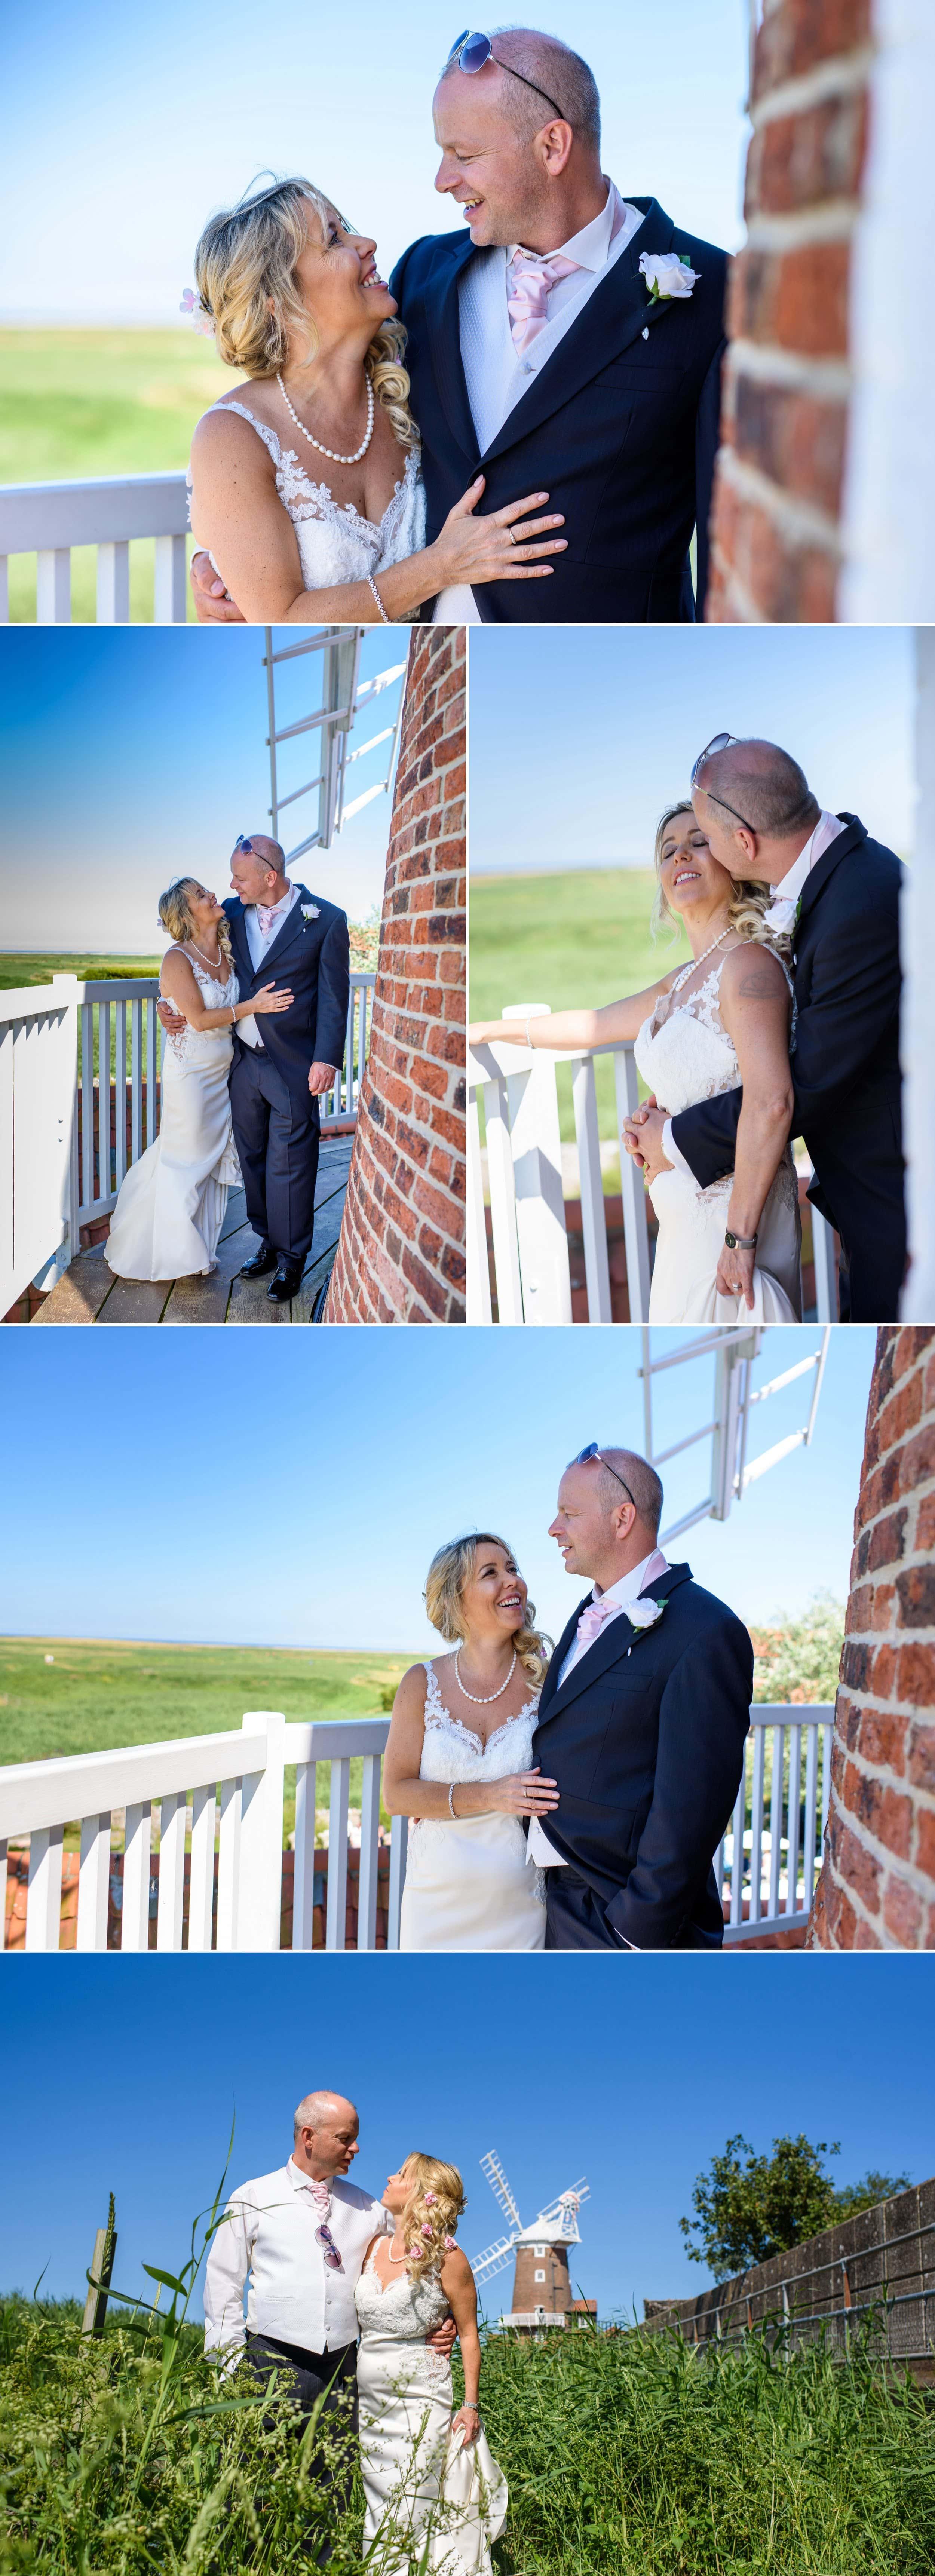 cley_windmill_norfolk_wedding_photography-11